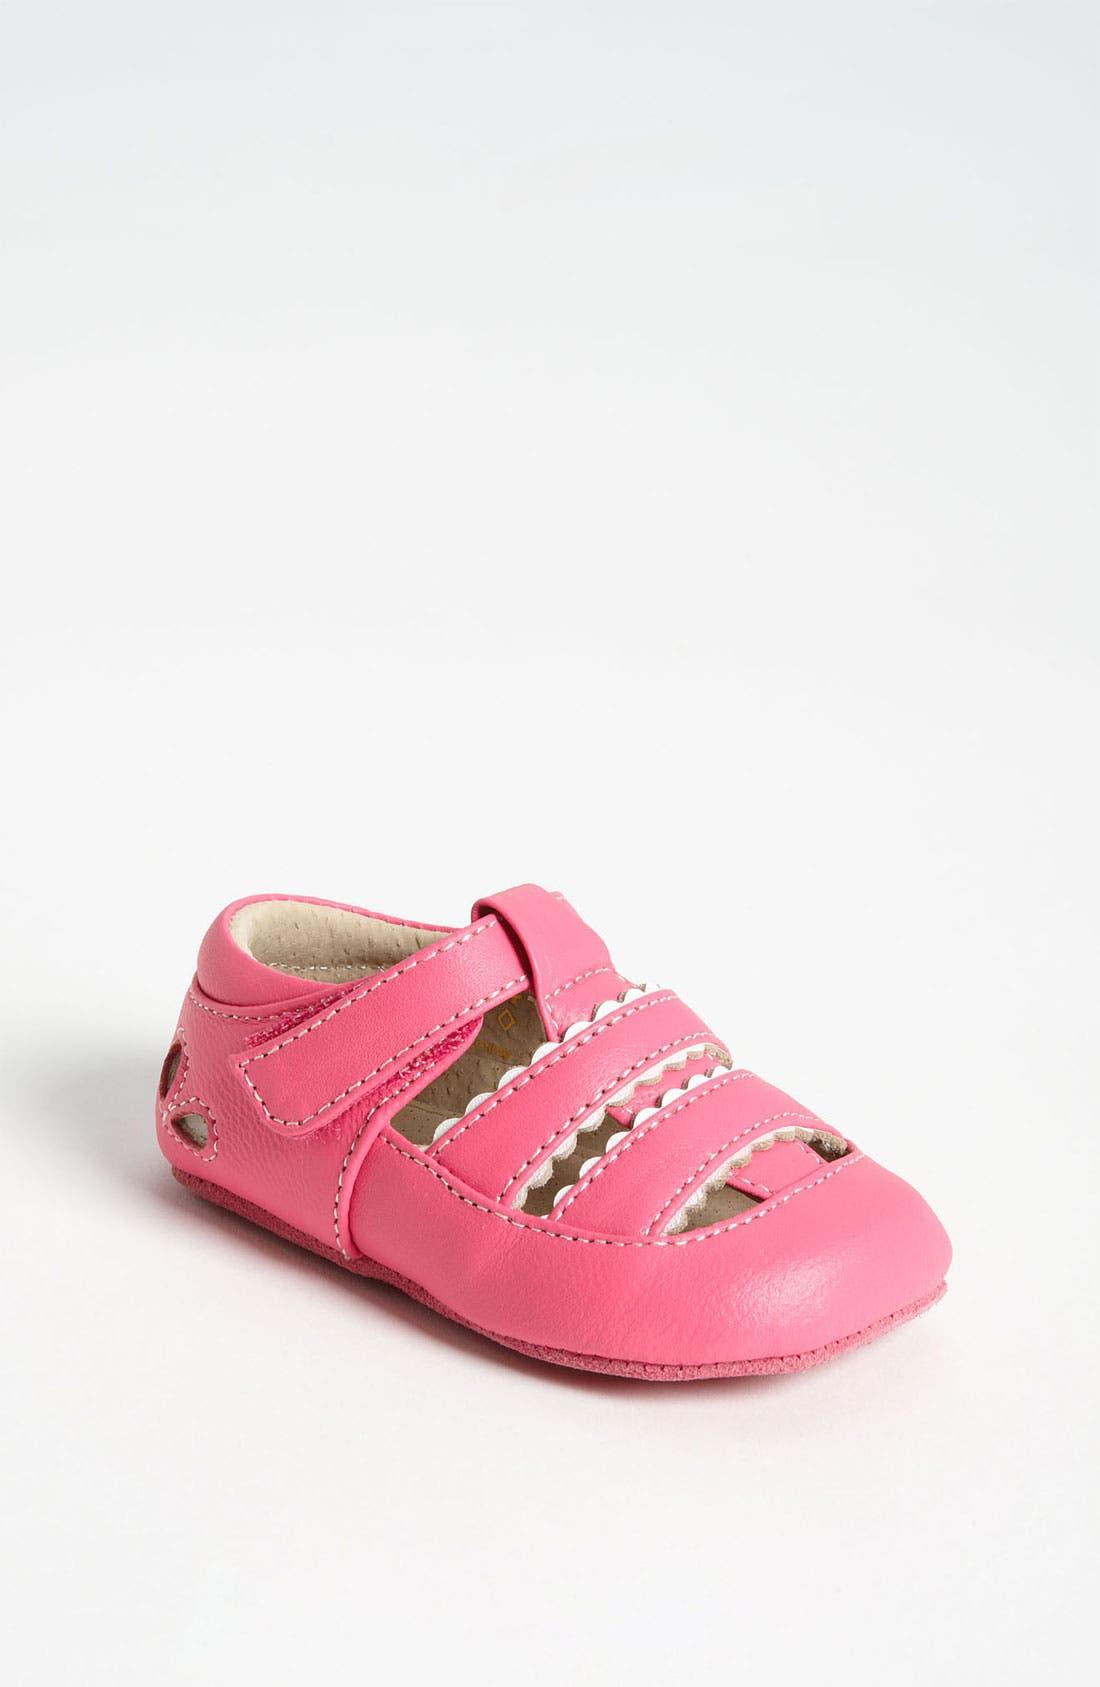 Alternate Image 1 Selected - See Kai Run 'Brook' Sandal (Baby & Walker)